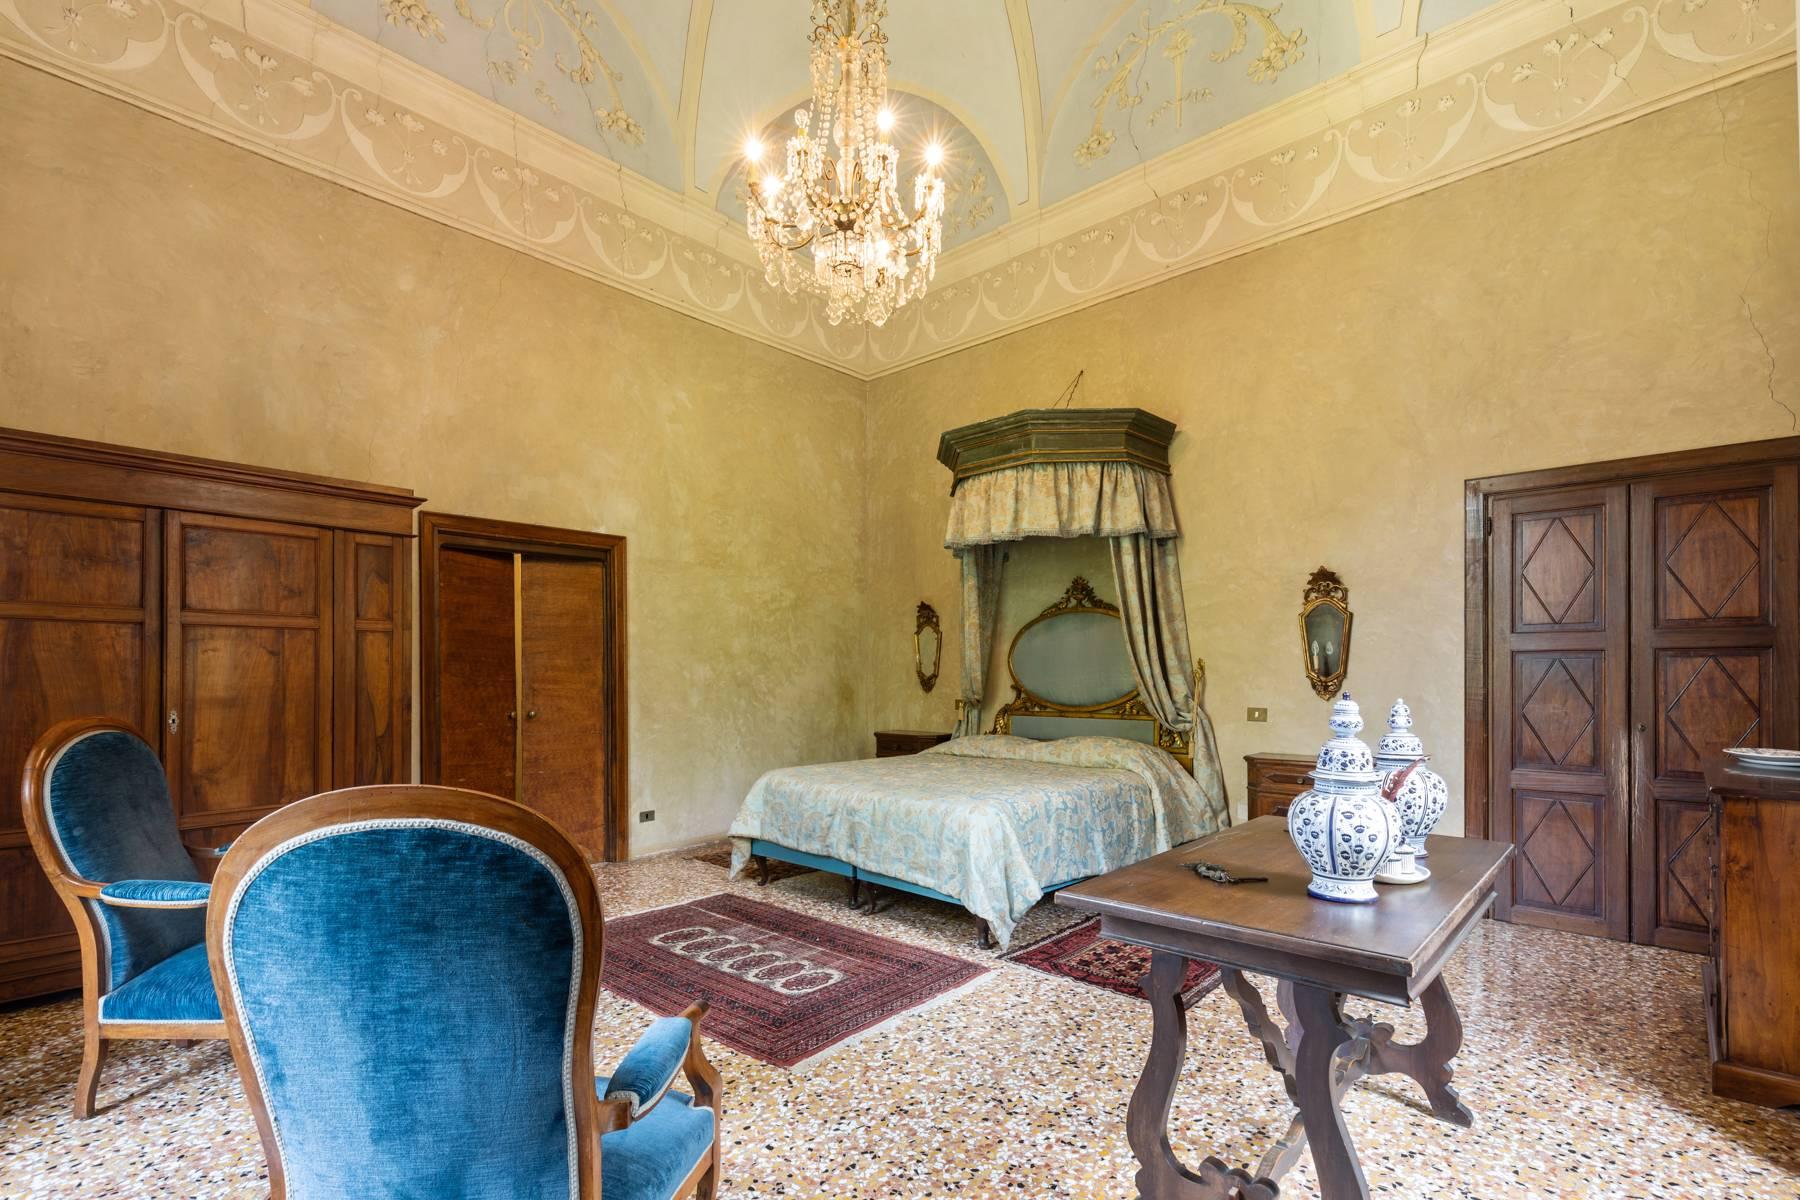 Villa in Vendita a Verona: 5 locali, 2400 mq - Foto 26